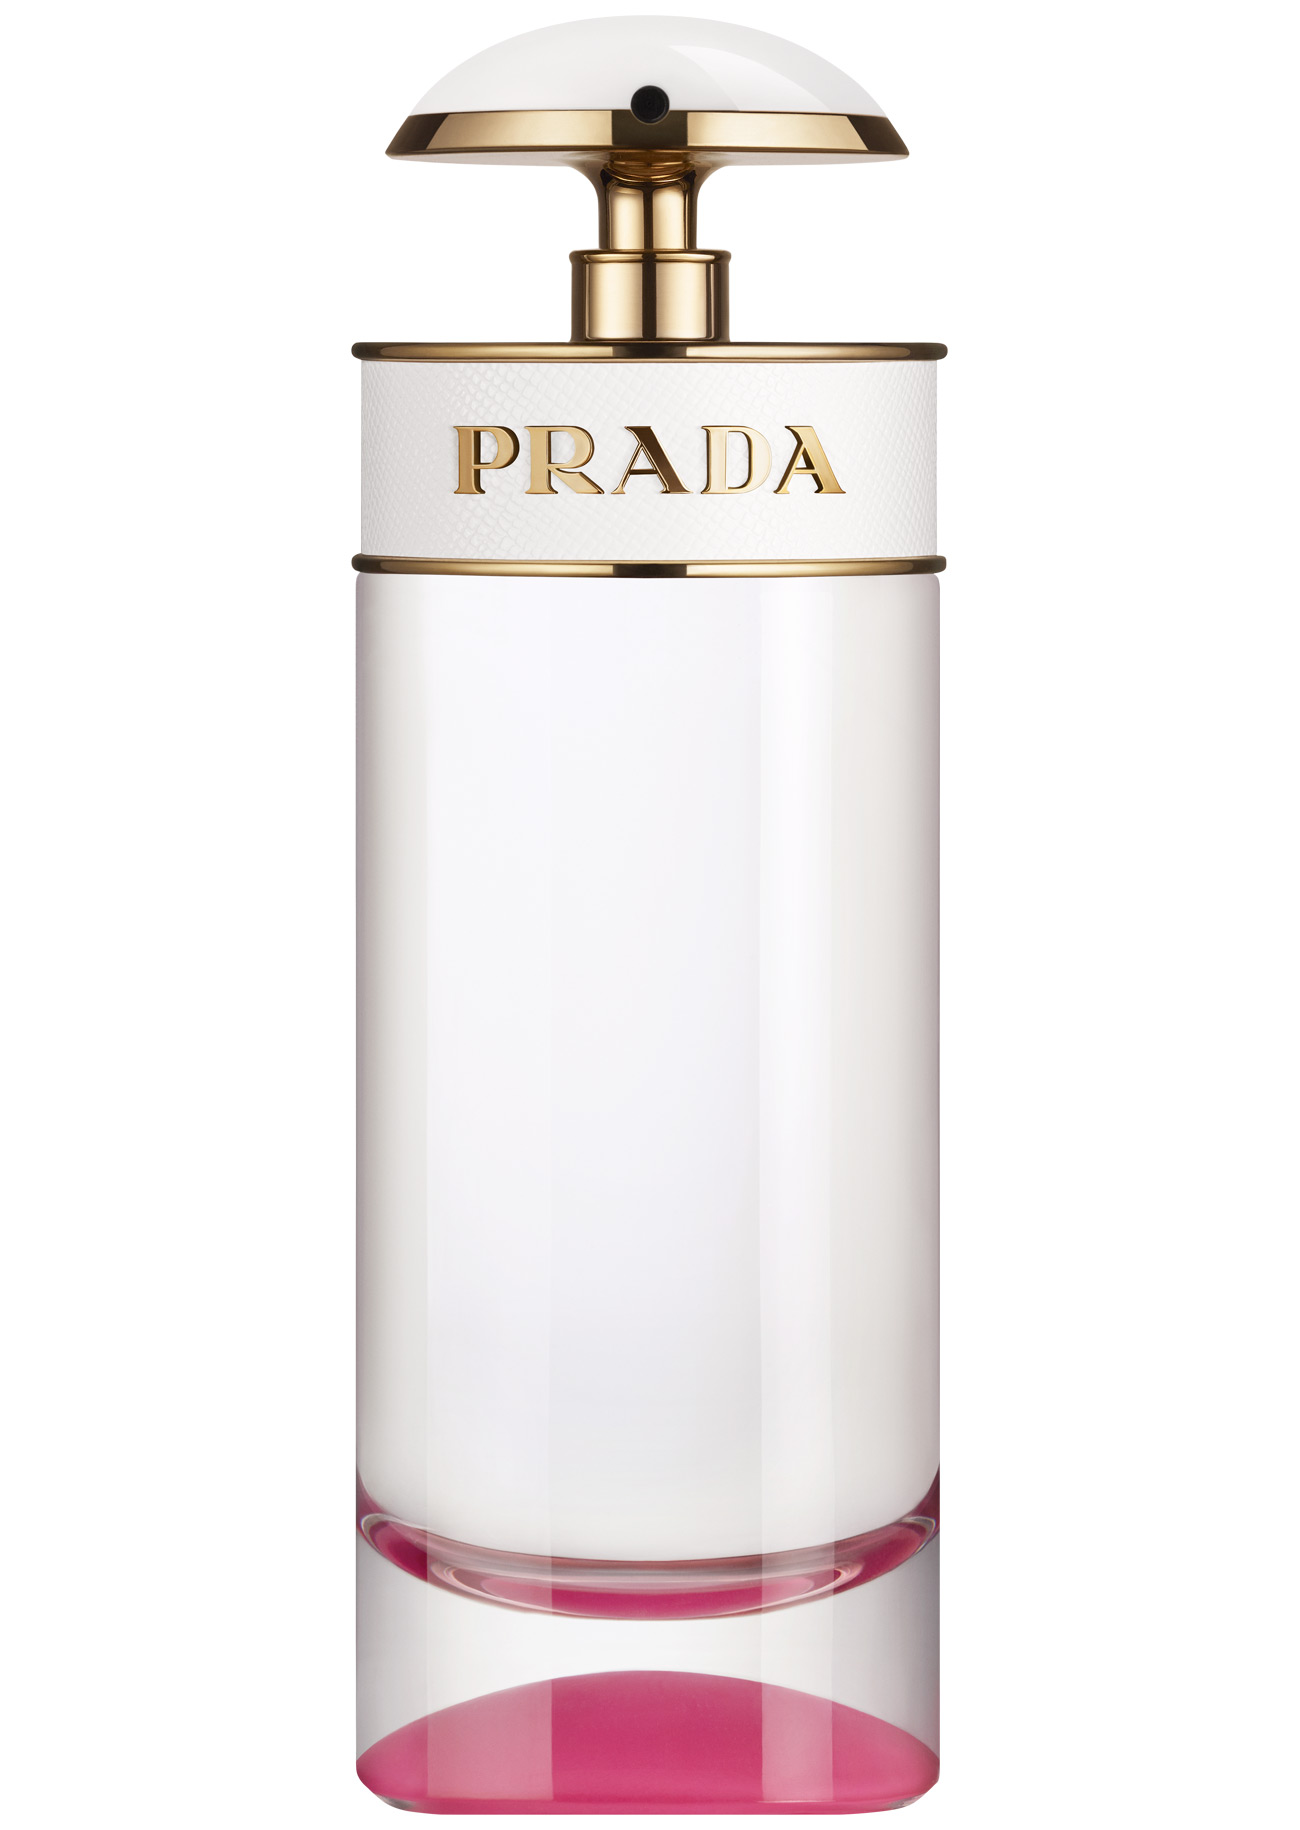 Prada Candy Kiss Prada perfume